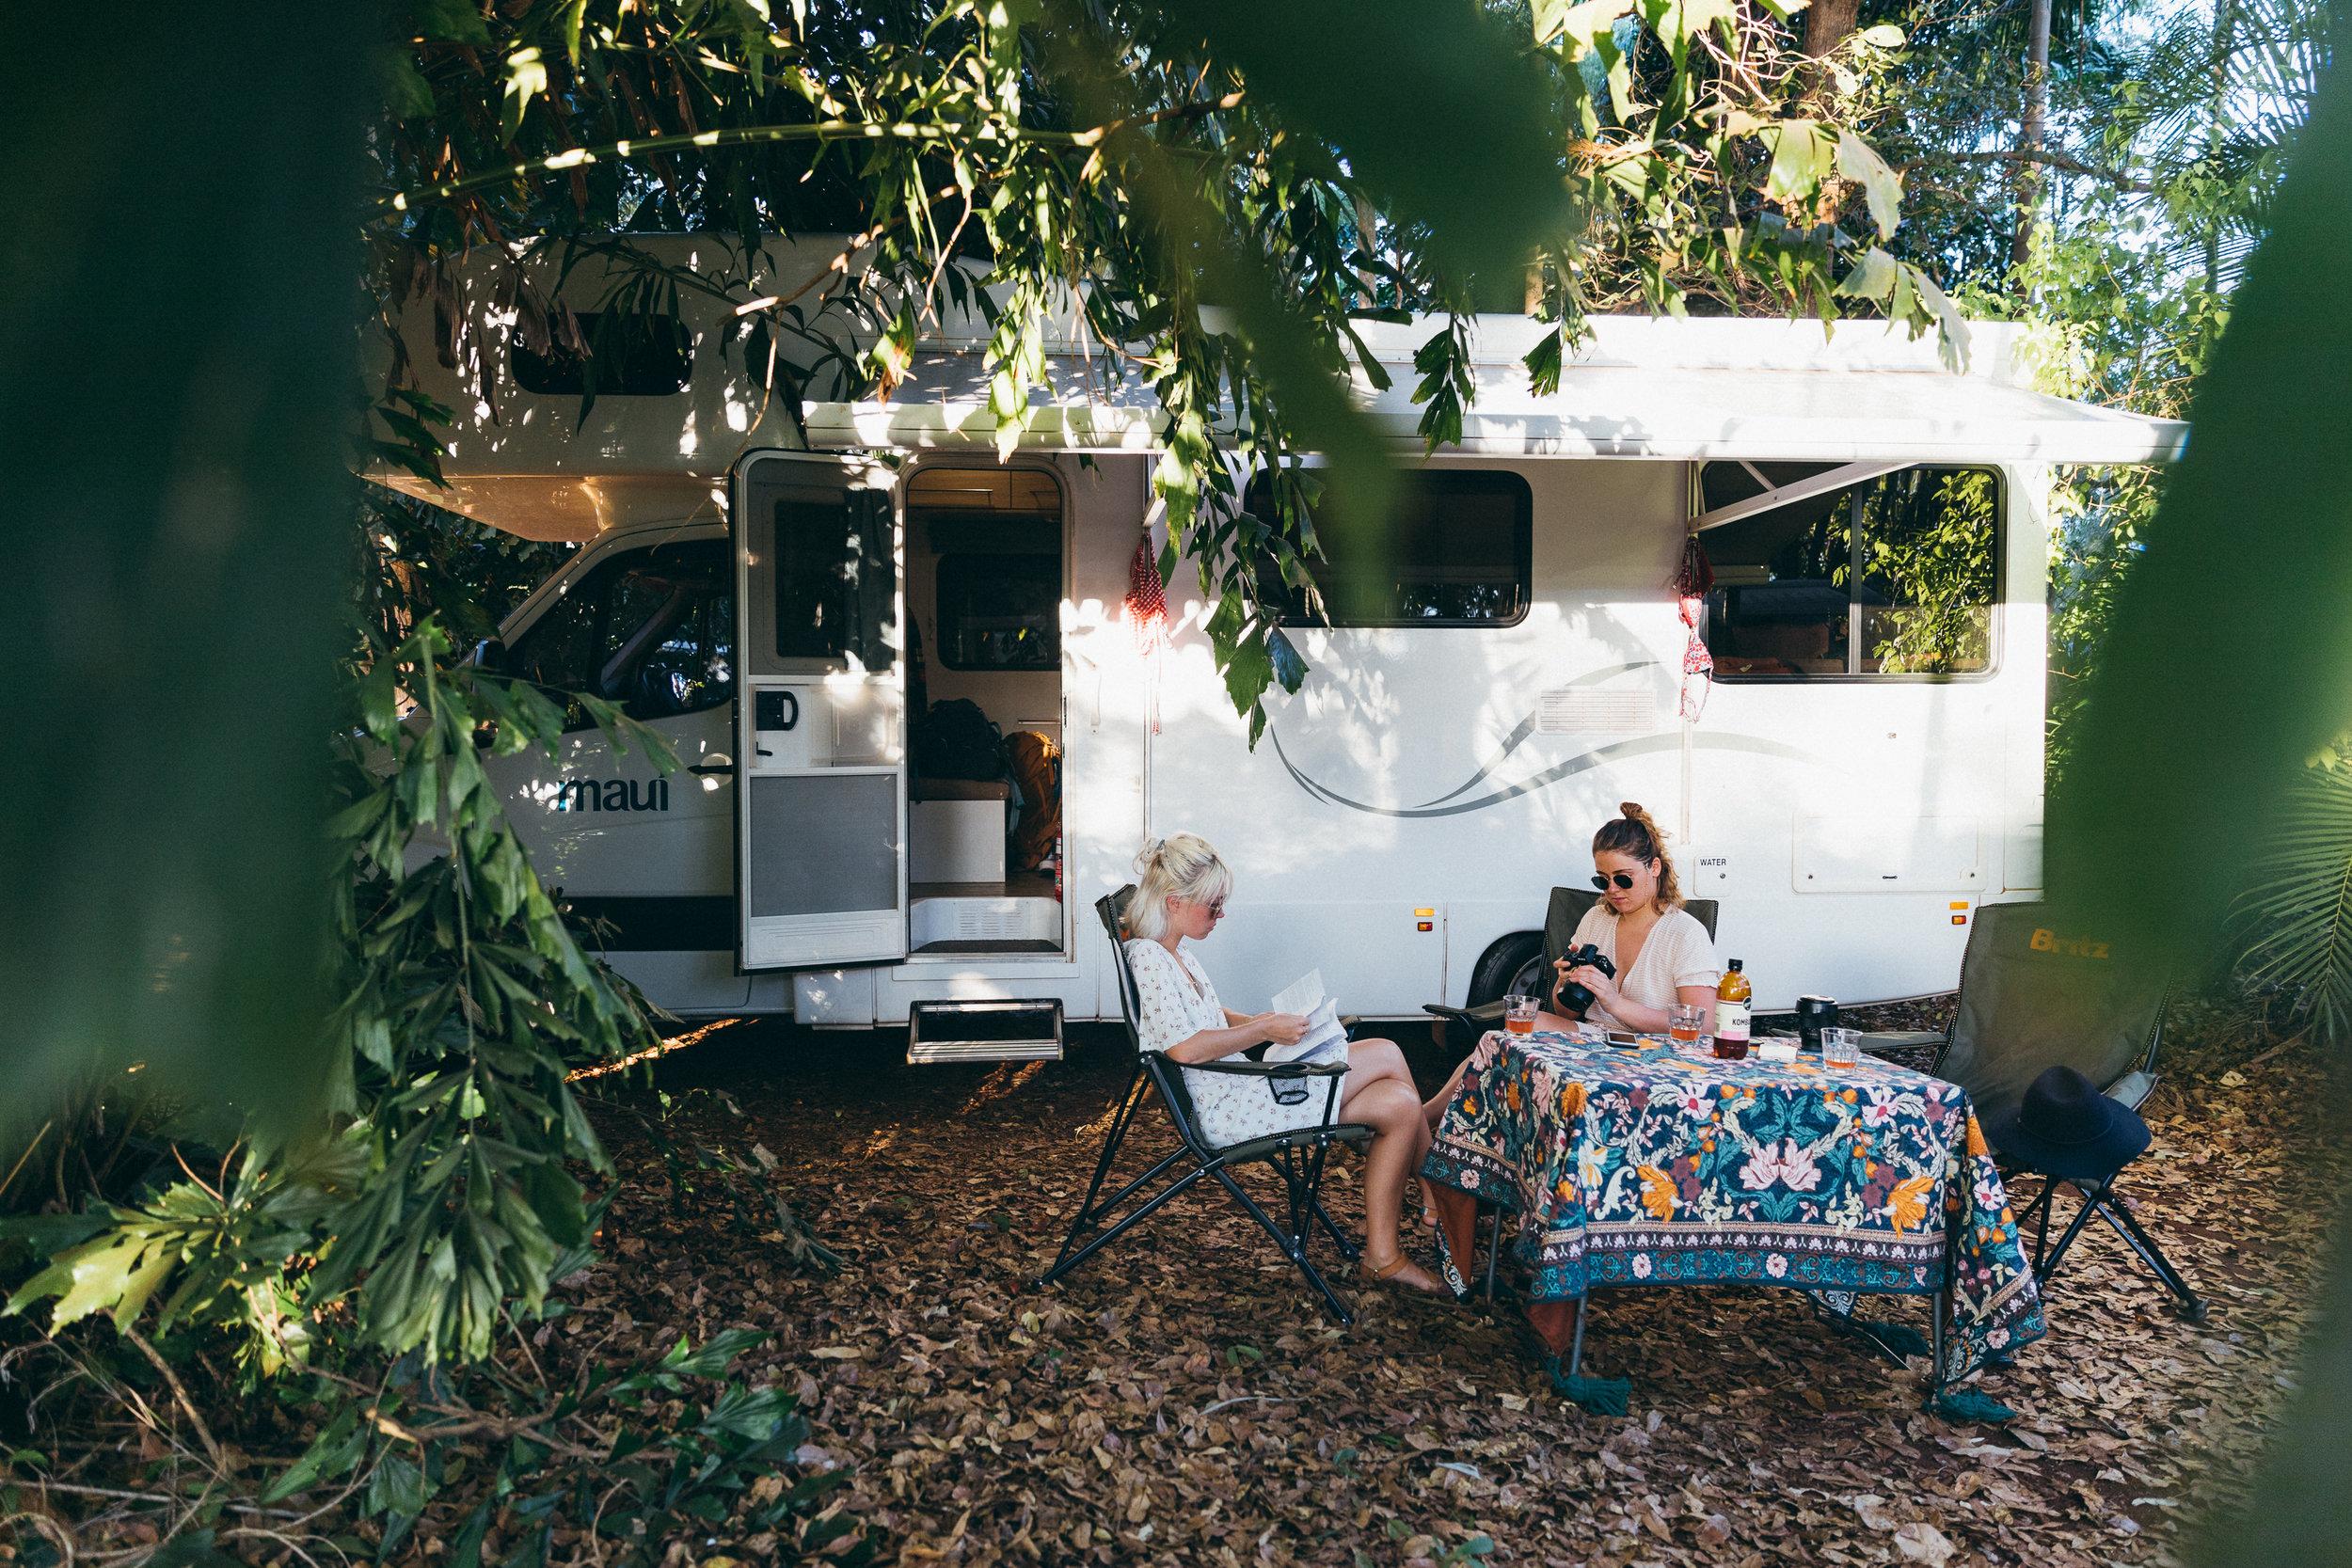 Melissa-Findley-Northern-Territory-Blog-13.jpg